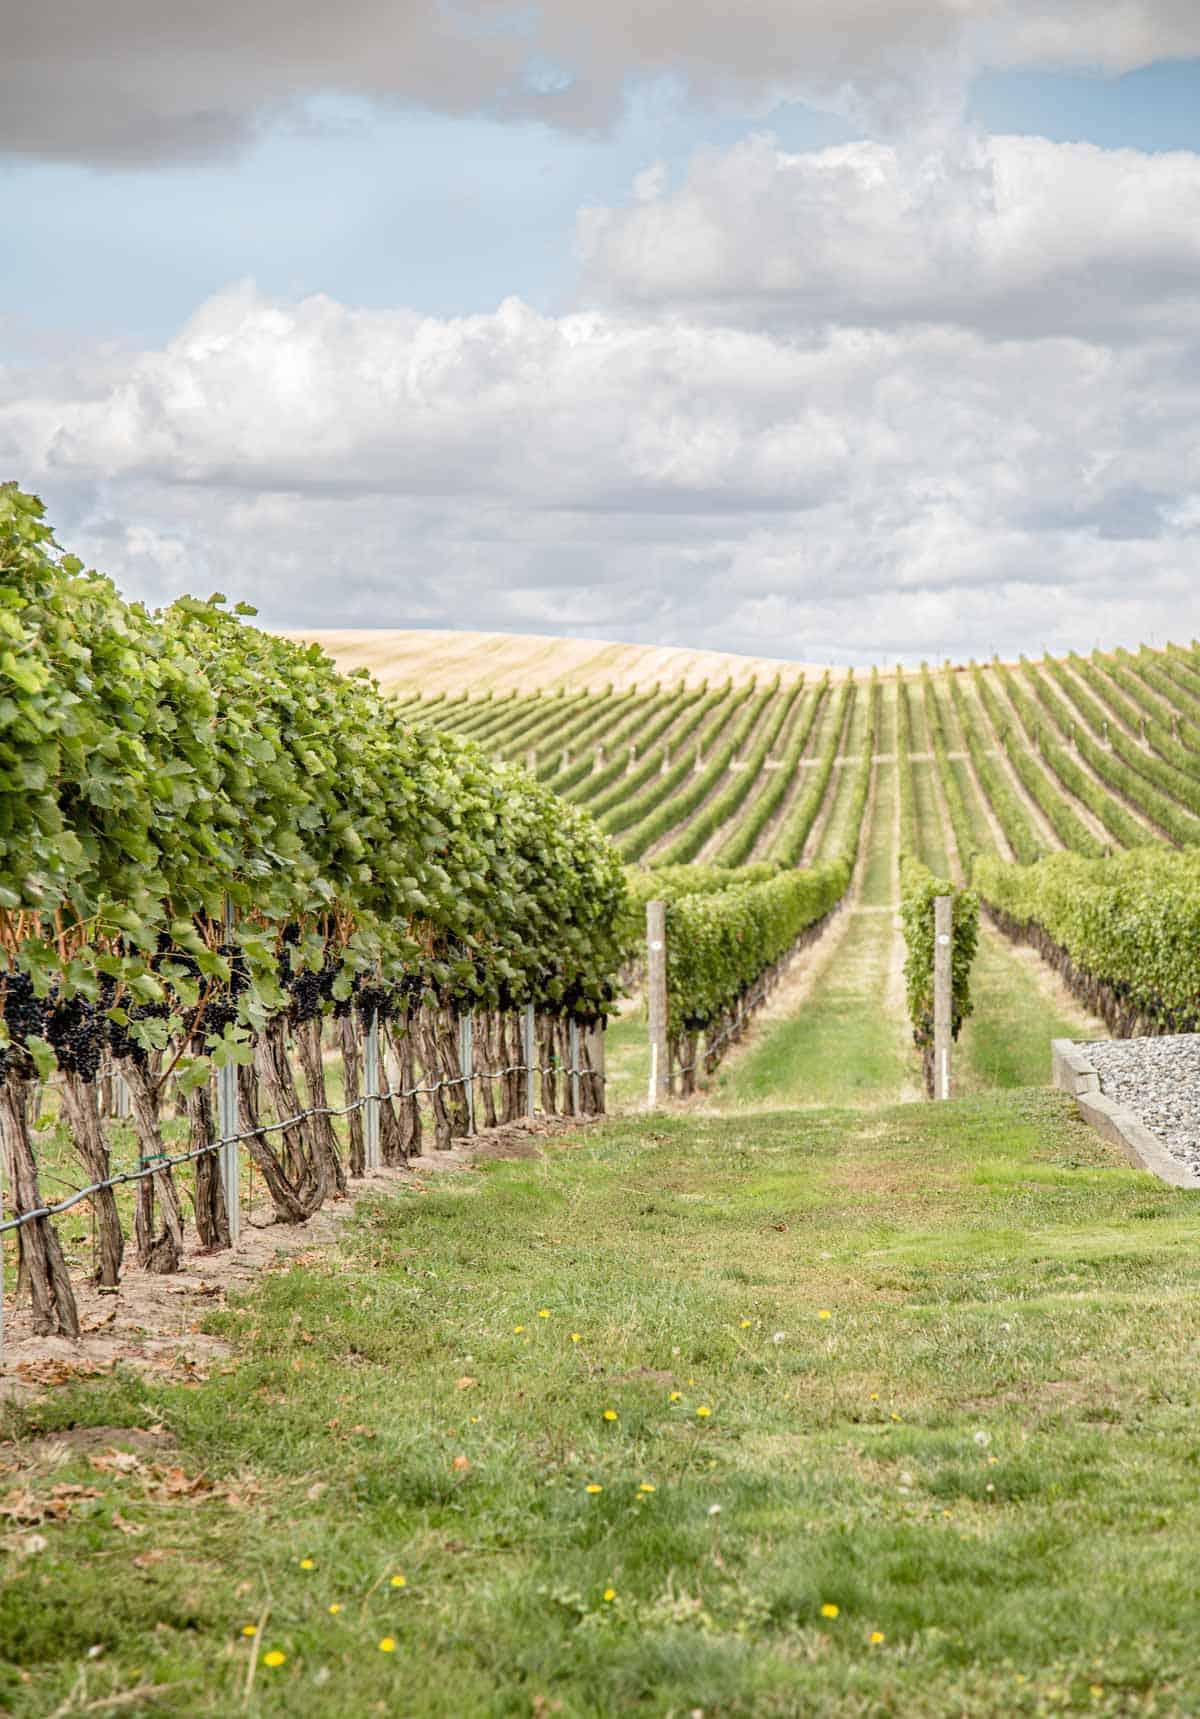 Vineyard in Walla Walla Washington